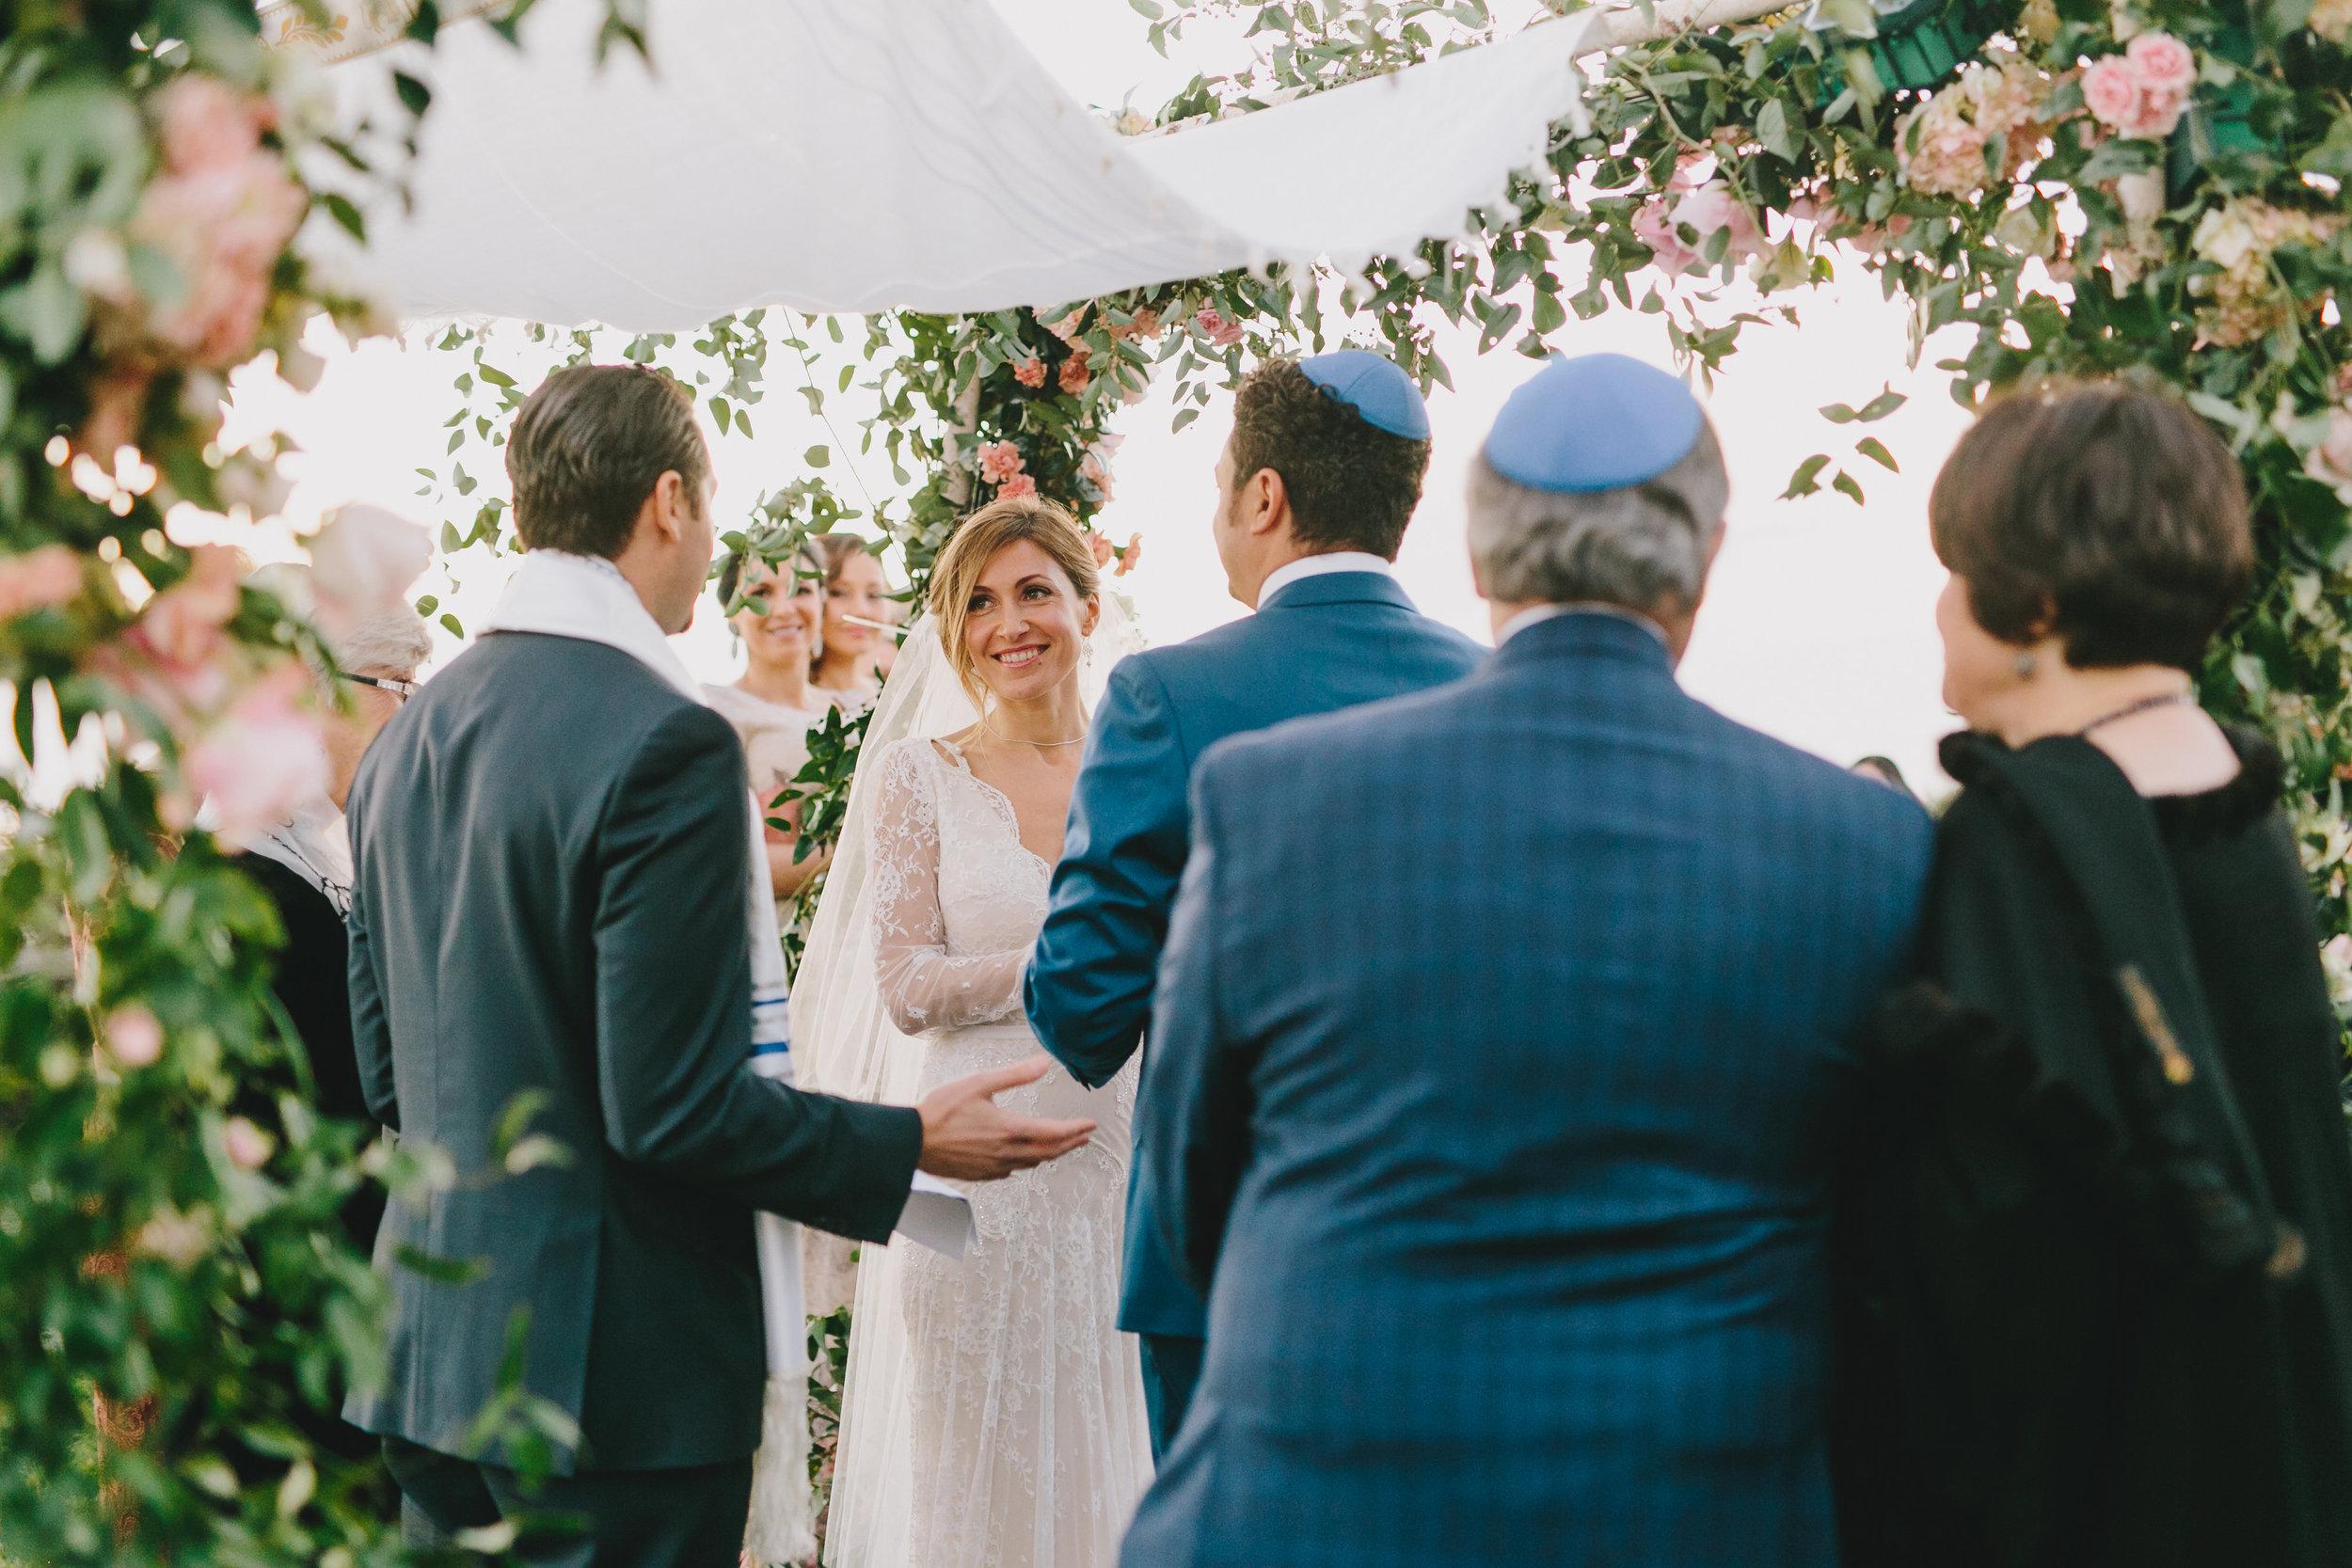 Daniel Natalie New Years Eve 2016 Wedding-00 weddingdayhighlights-0081.jpg